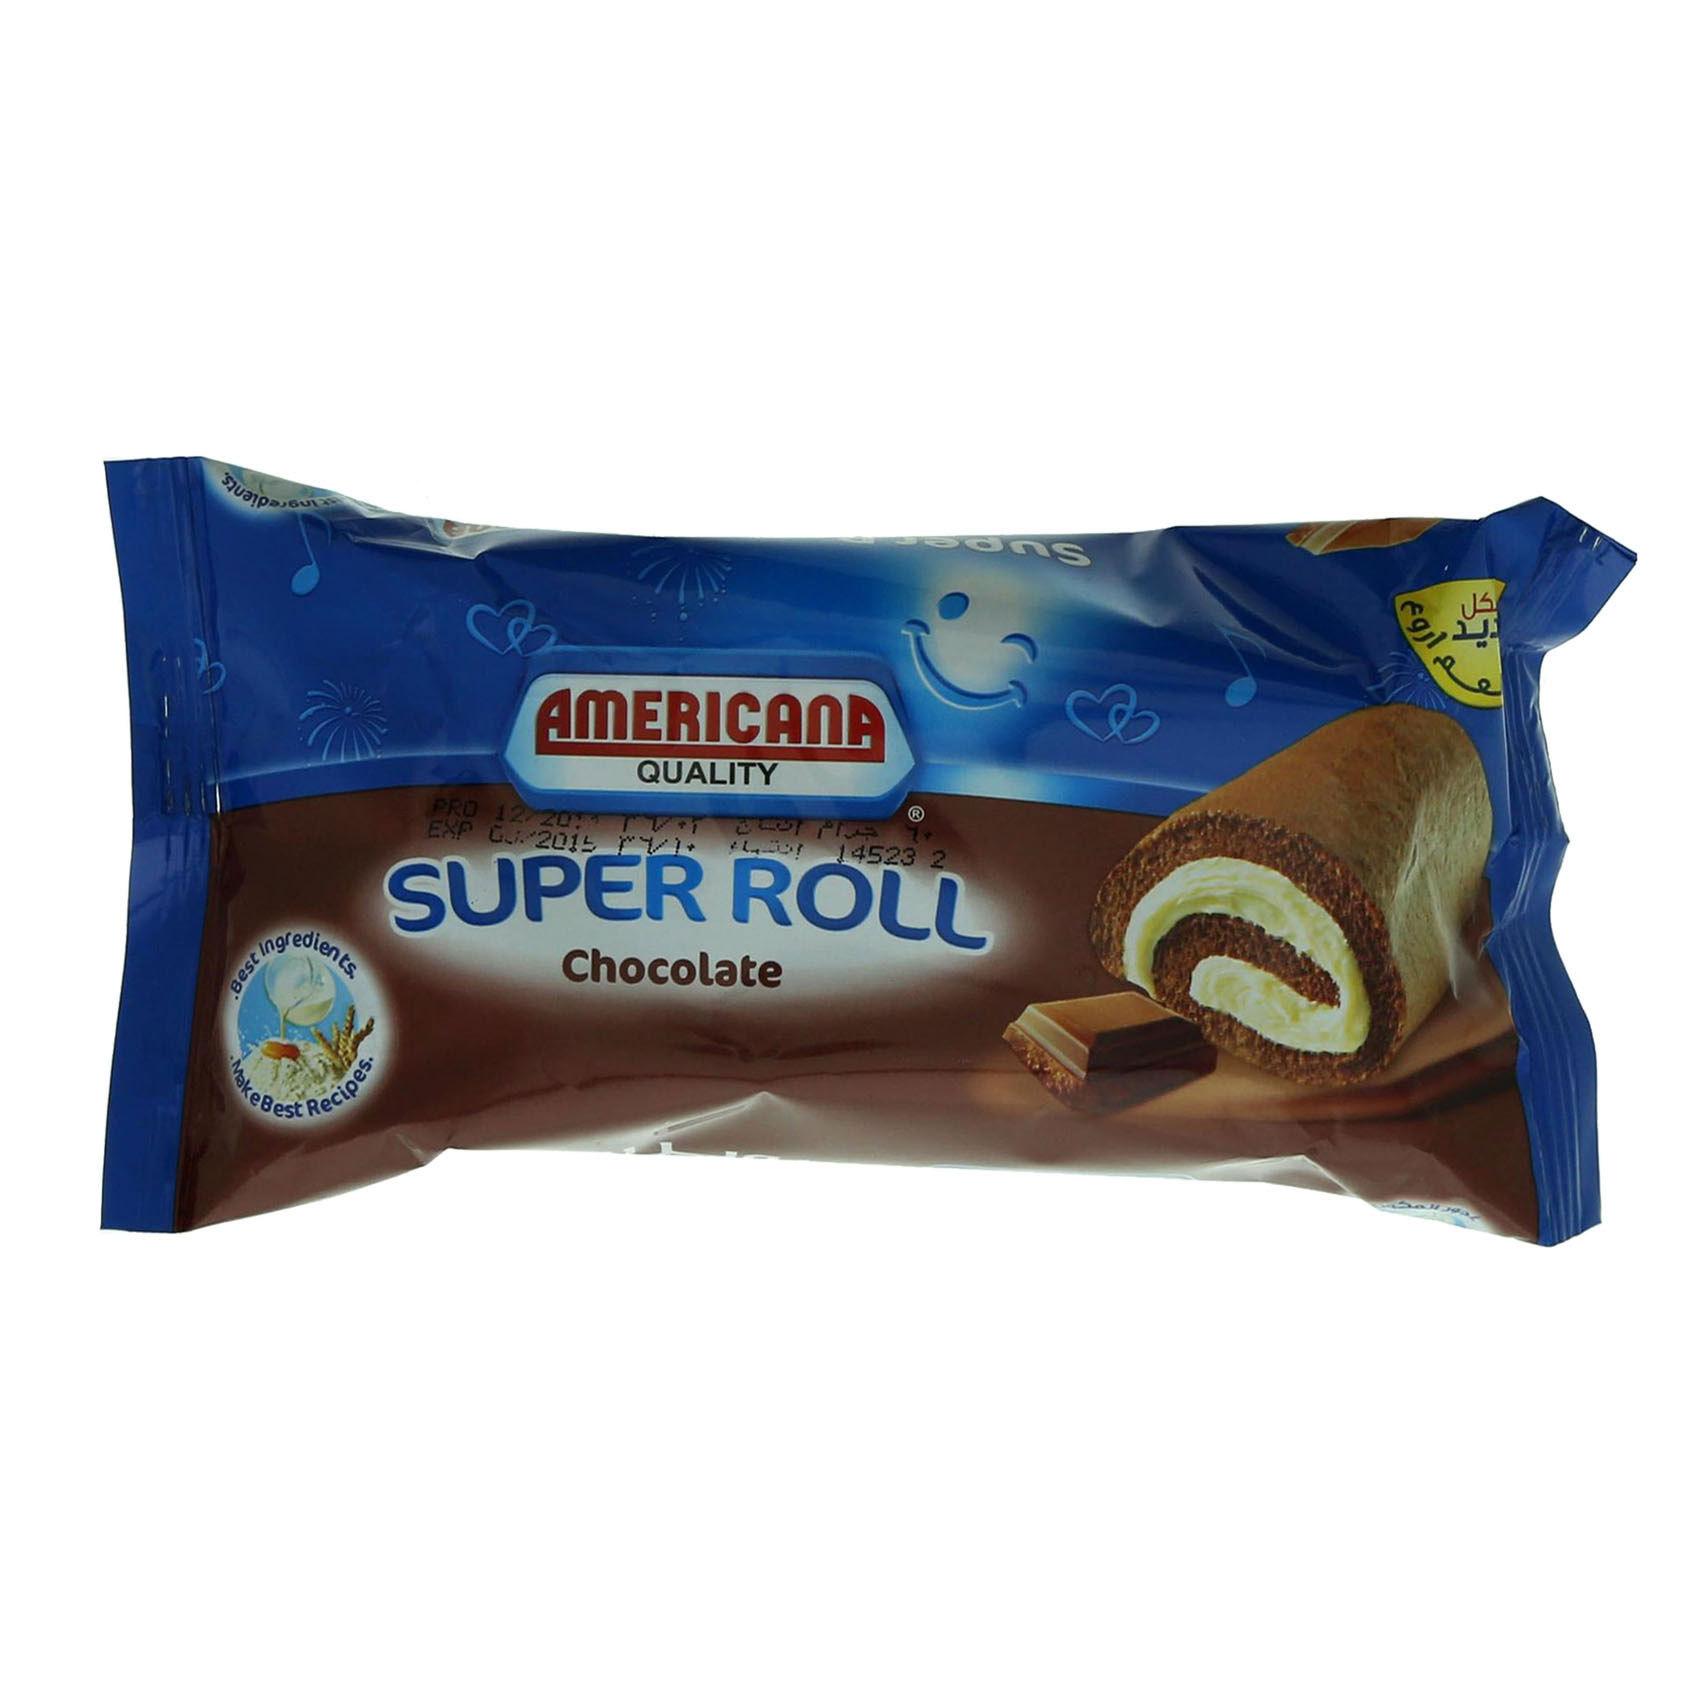 AMERICANA SUPER ROLL CHOCO 60G